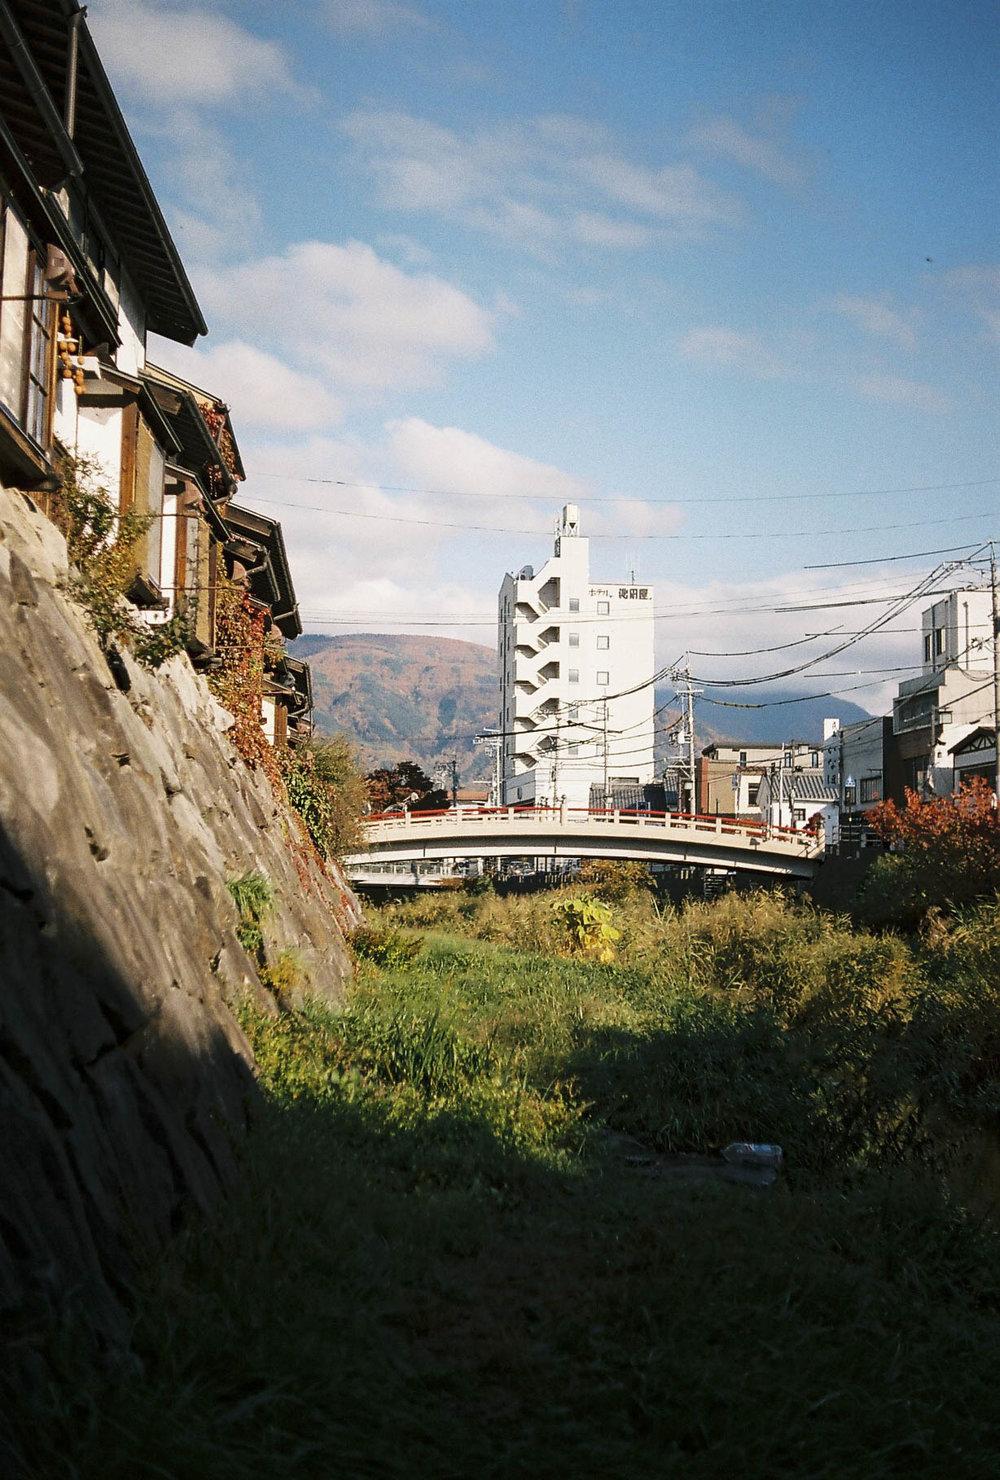 BDAY_LA_JAPAN_SNAP_LQ_201.JPG